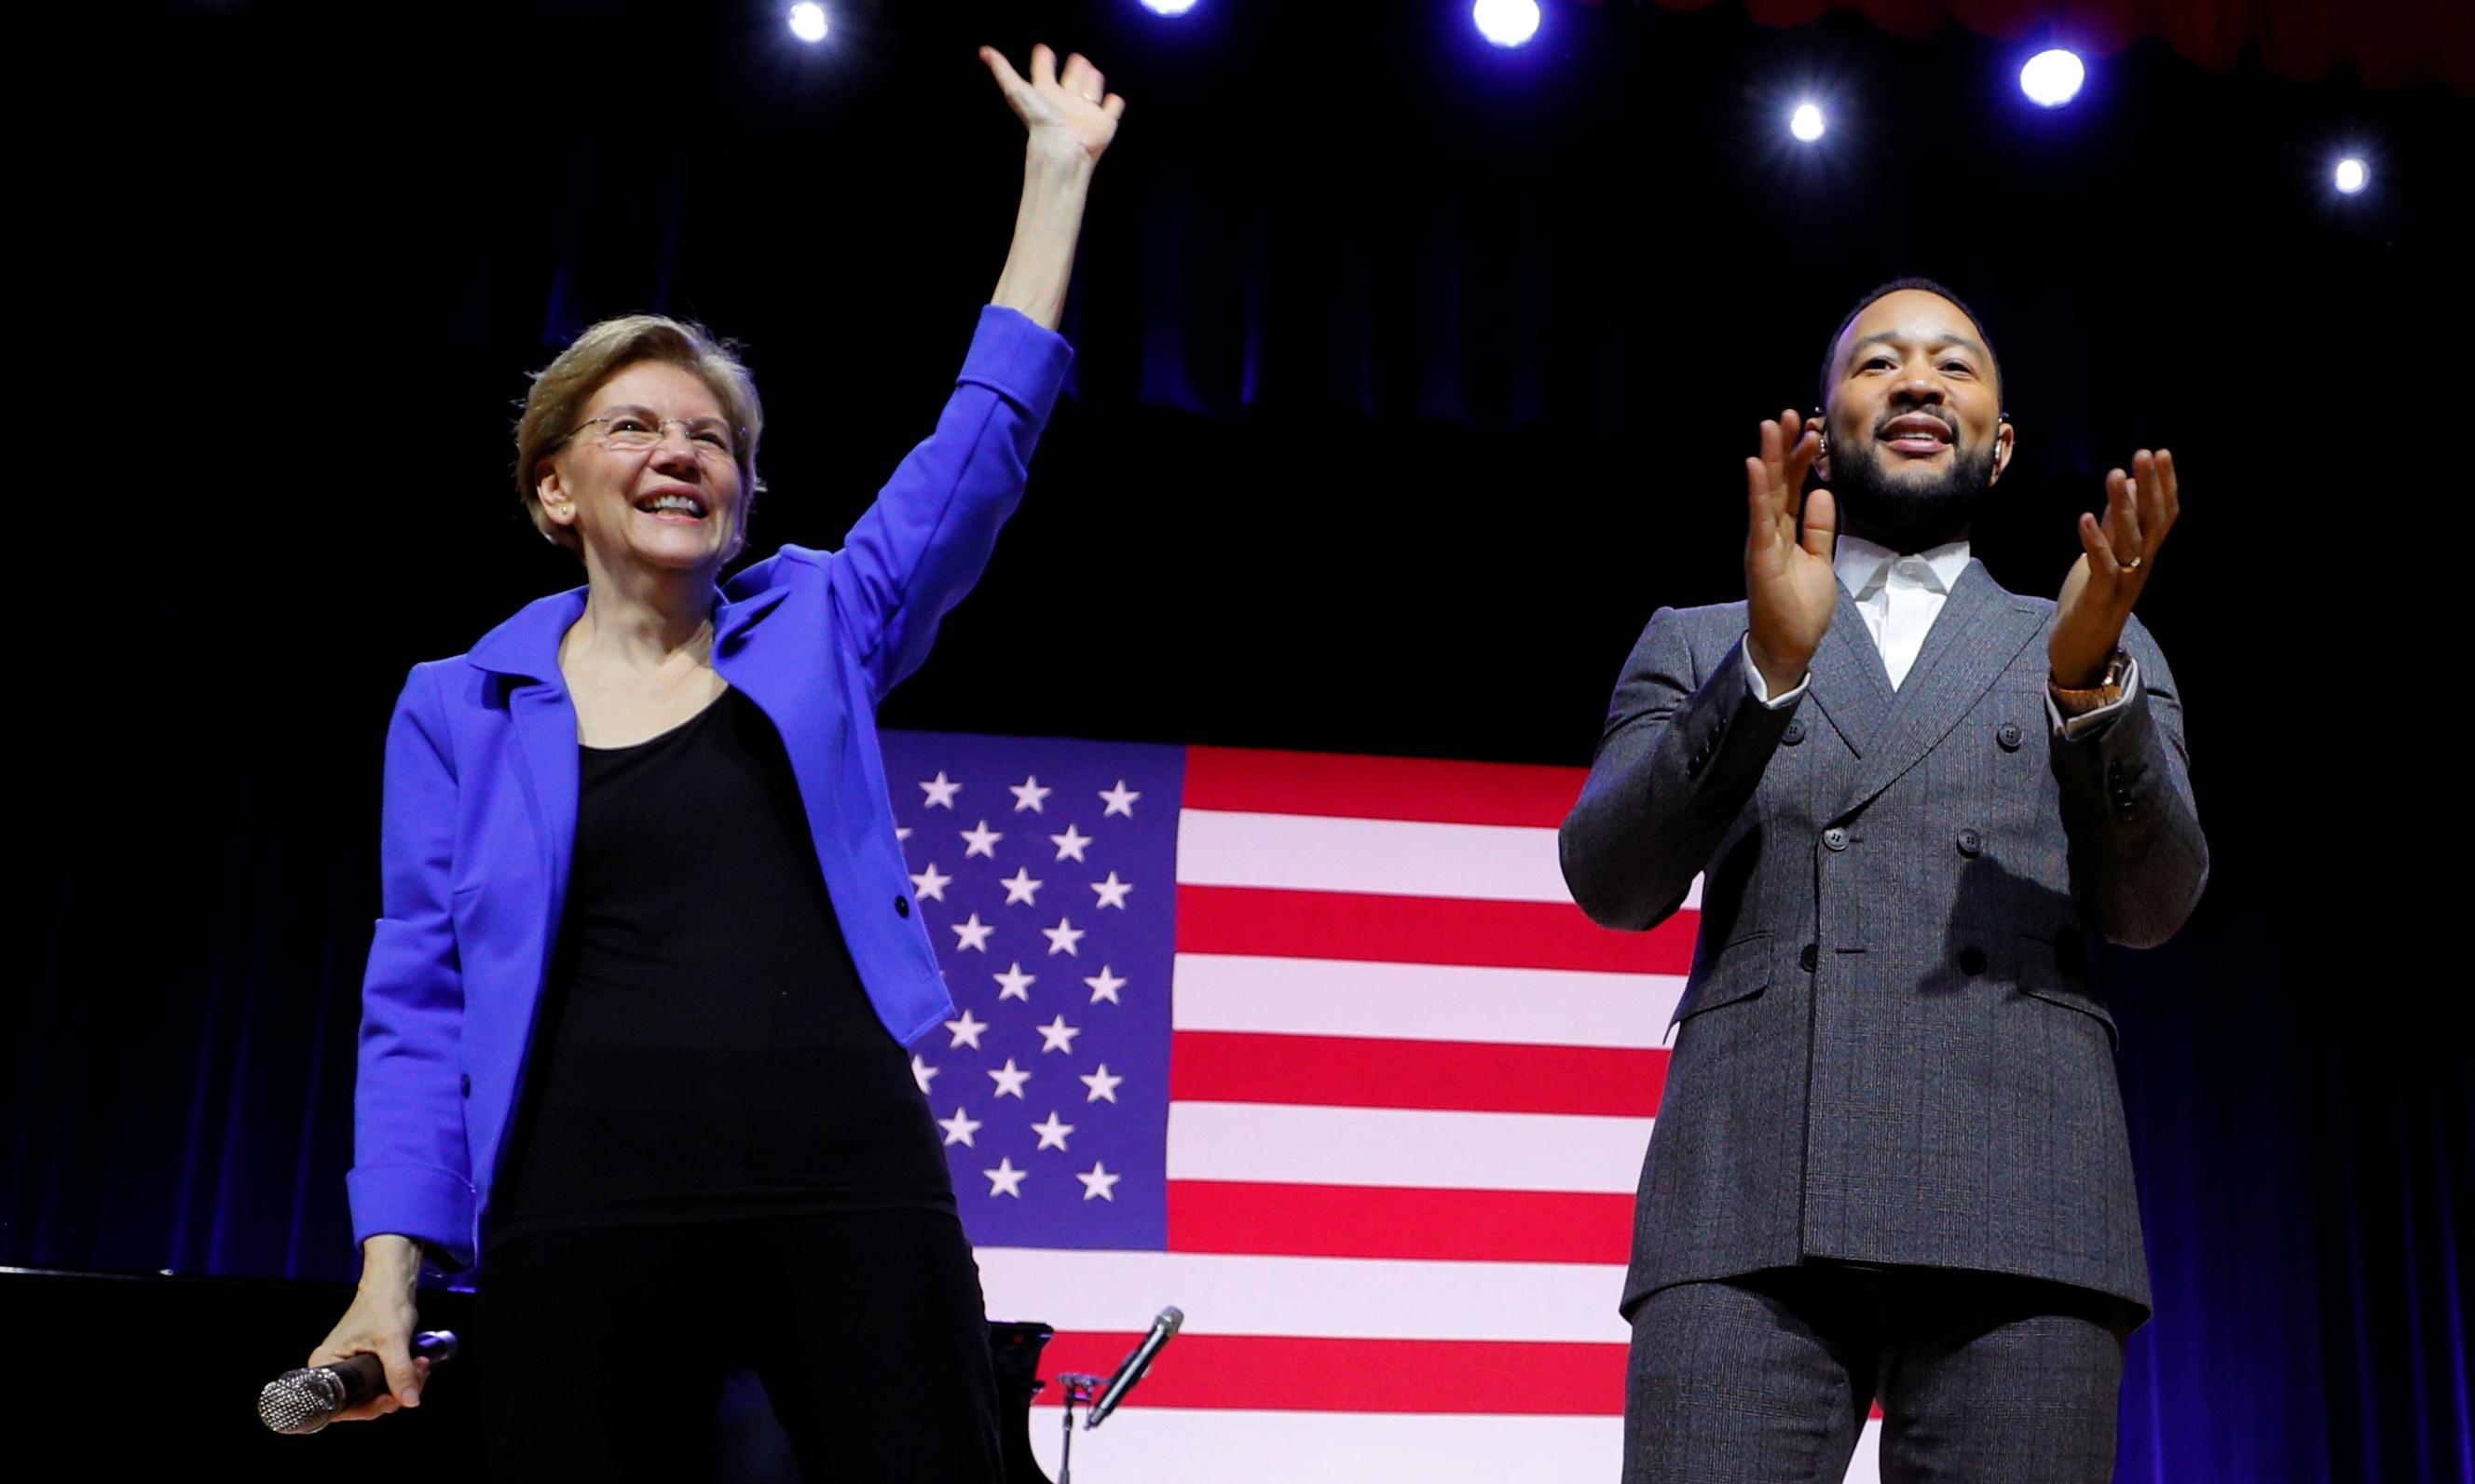 John Legend adds star power to Elizabeth Warren's primary push